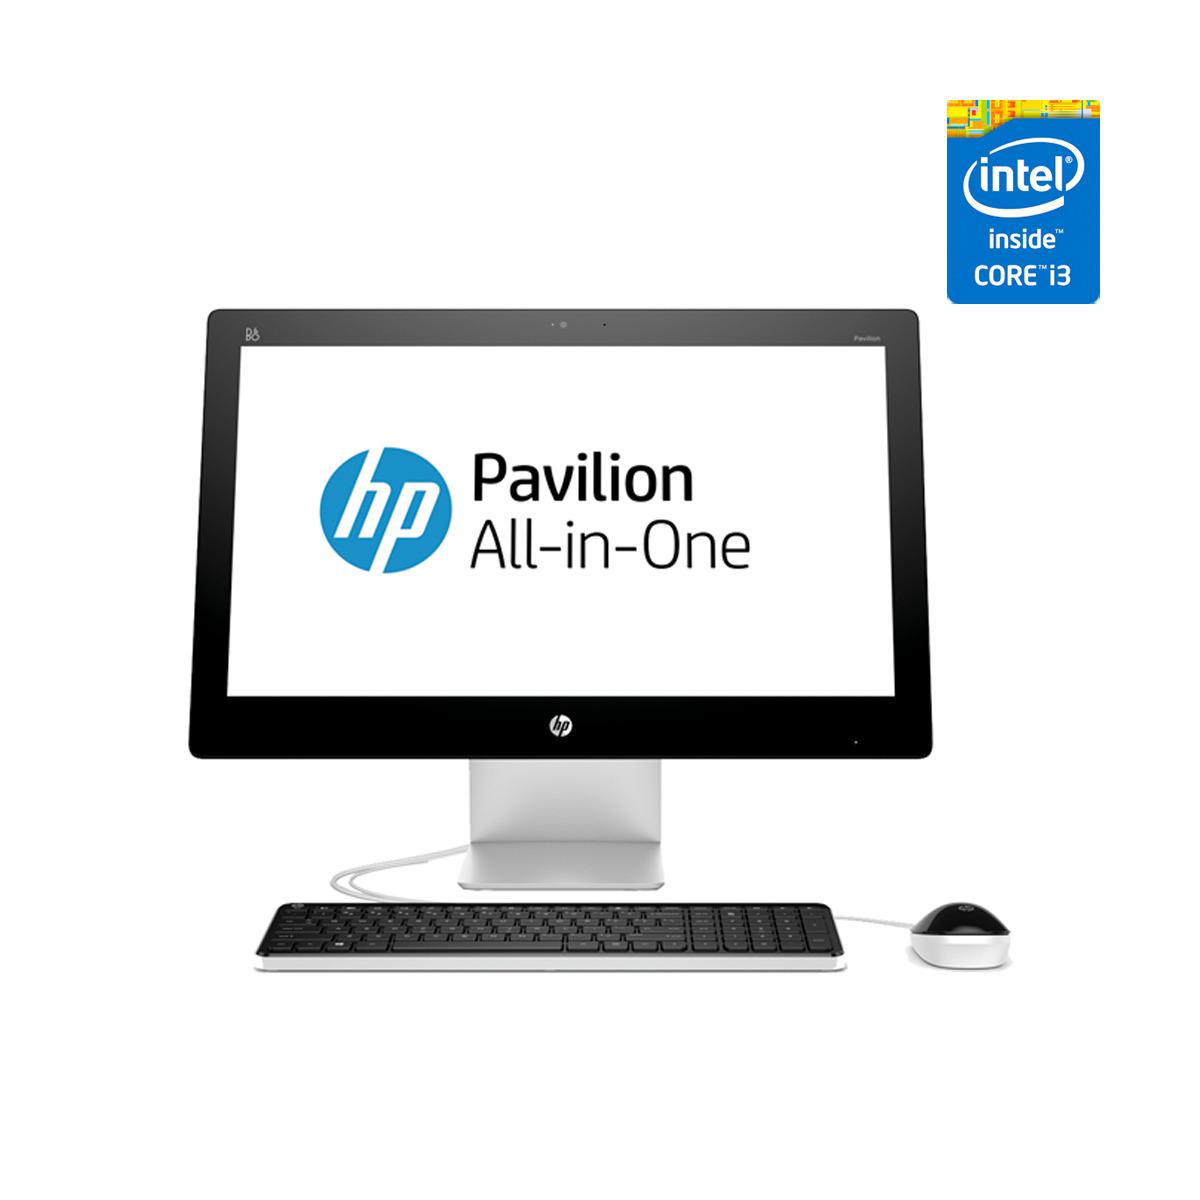 Ordenador sobremesa HP Pavilion All in One 23-q020ns Intel Core i3-4170T